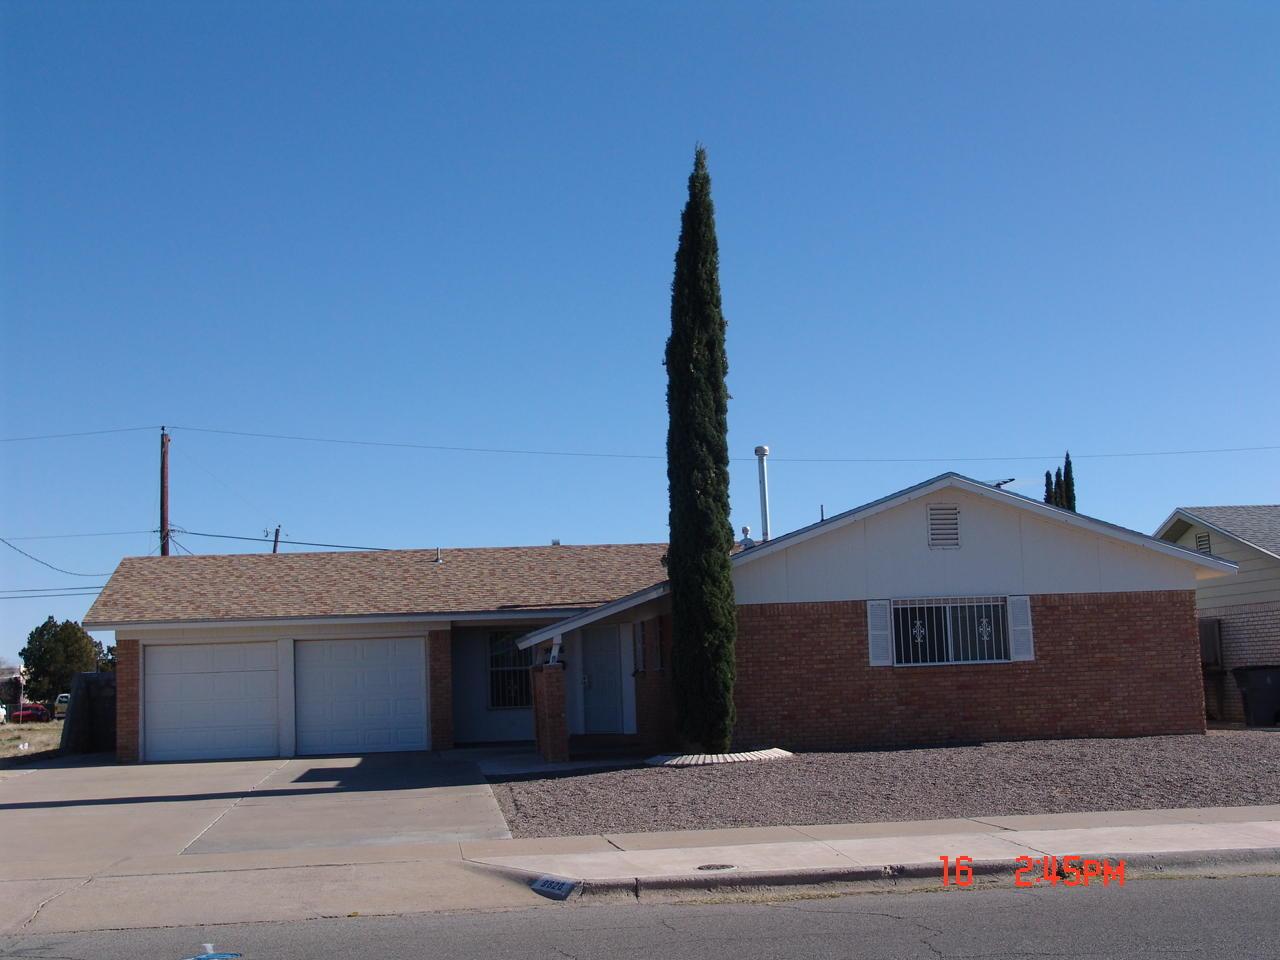 9626 Eloice, El Paso, Texas 79924, 3 Bedrooms Bedrooms, ,2 BathroomsBathrooms,Residential Rental,For Rent,Eloice,819978